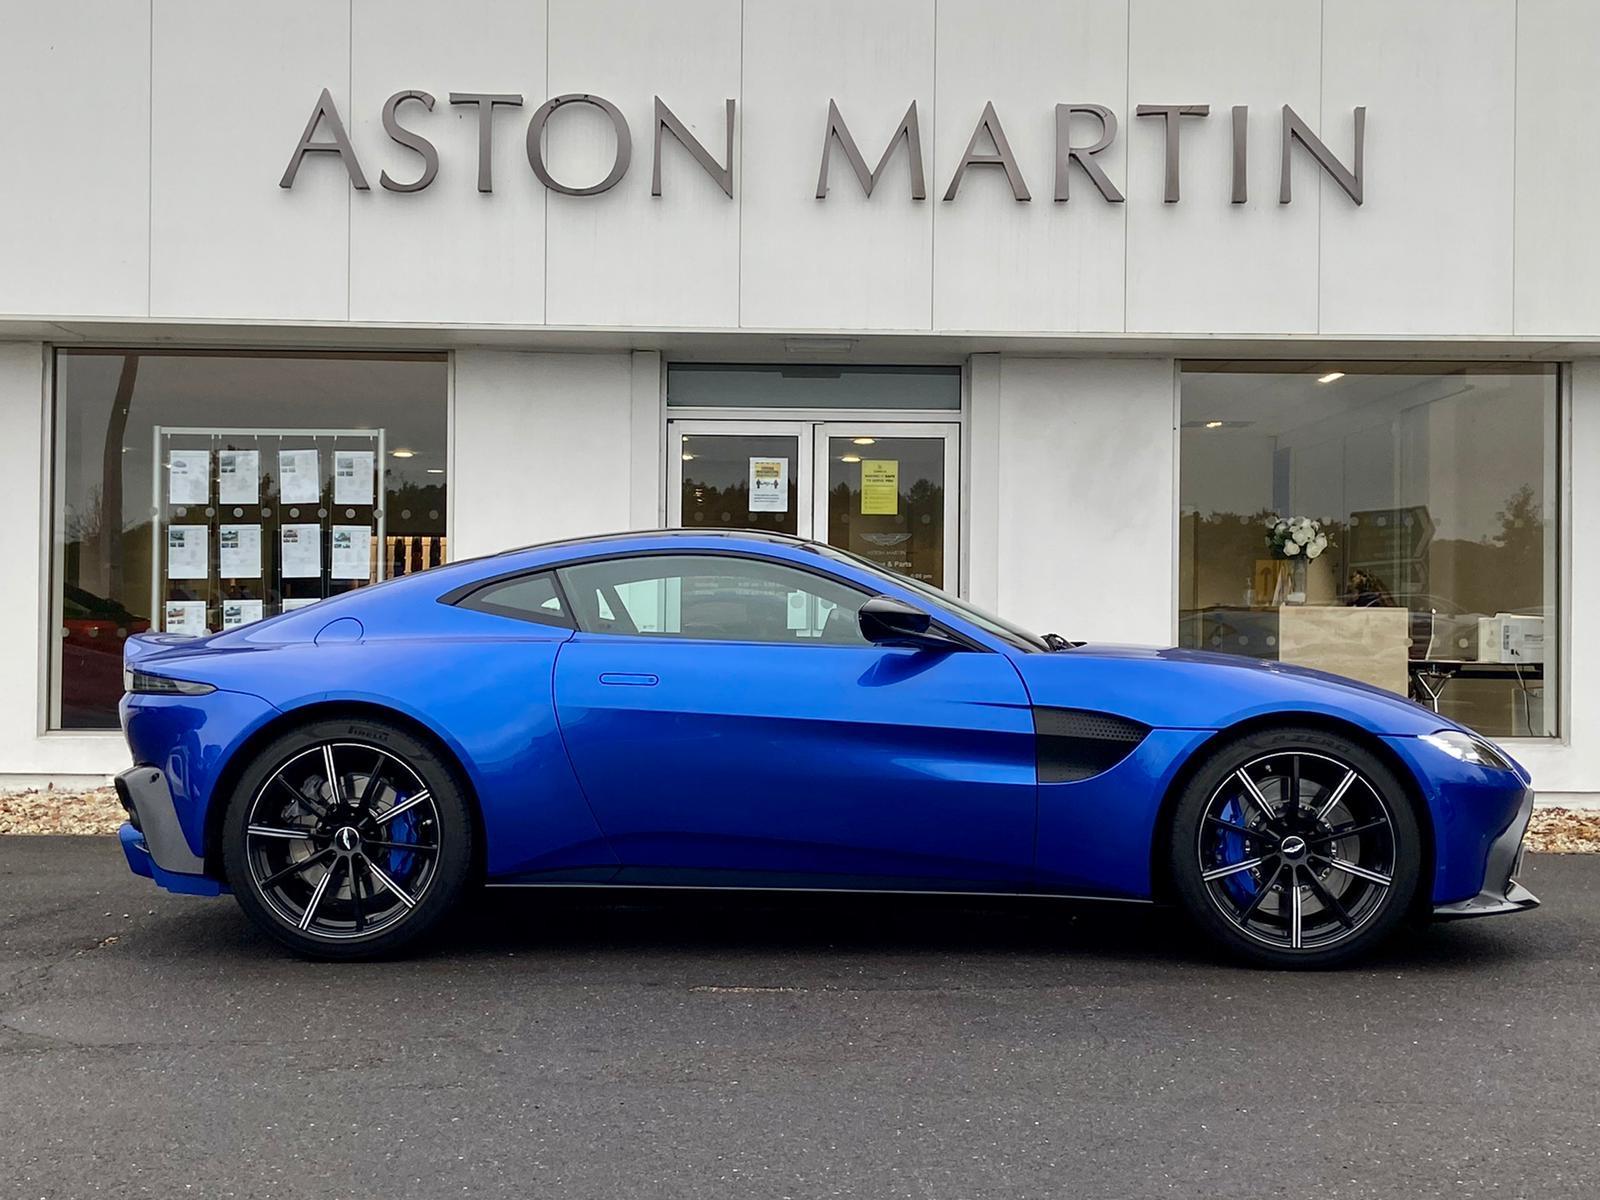 Aston Martin New Vantage 2dr ZF 8 Speed image 4